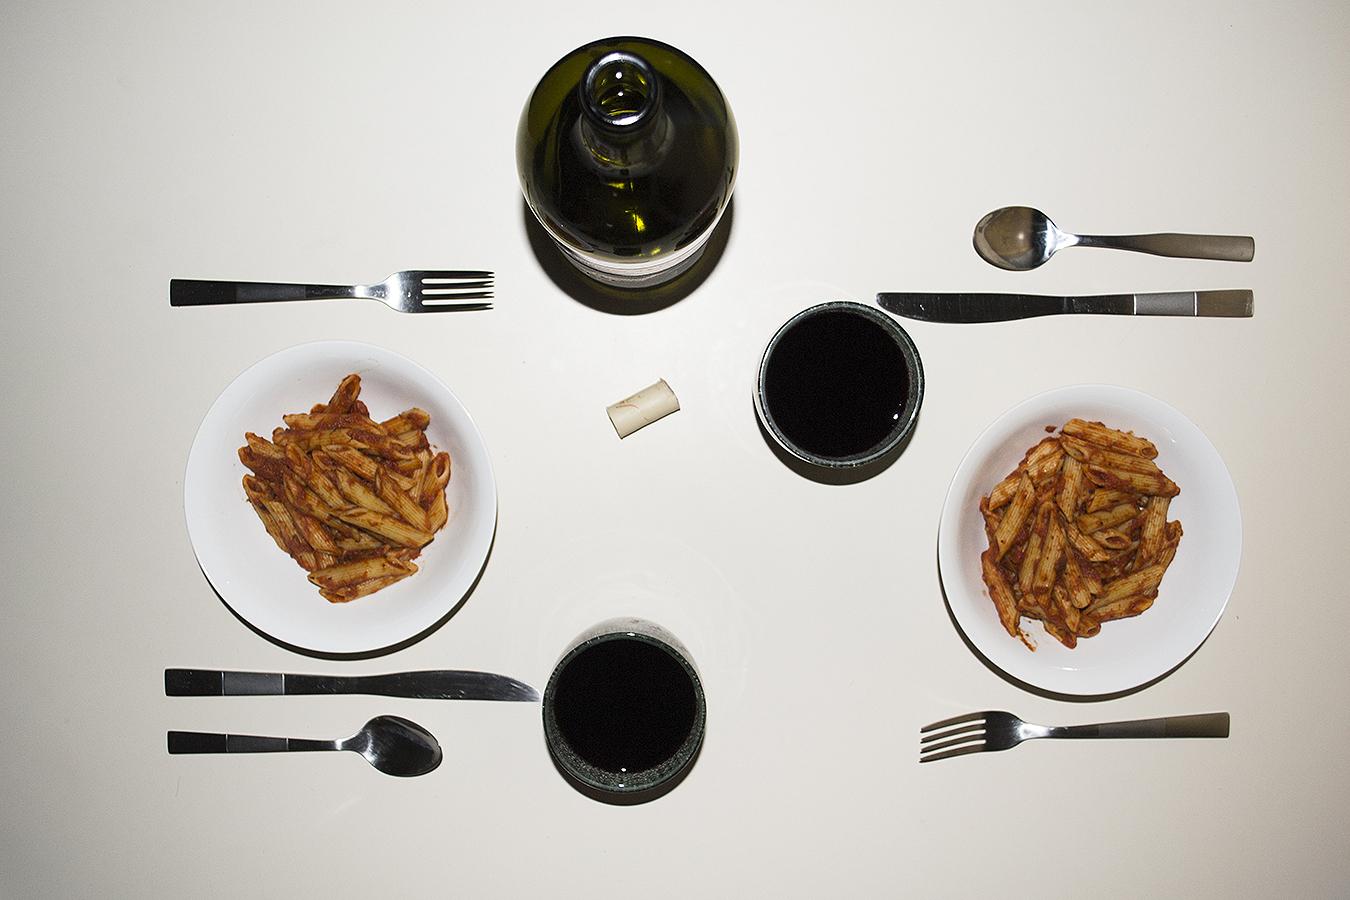 Alexis_Masino_photography_drugs_coffee_habits_addiction_UPenn_student_addictions_prozac_wine